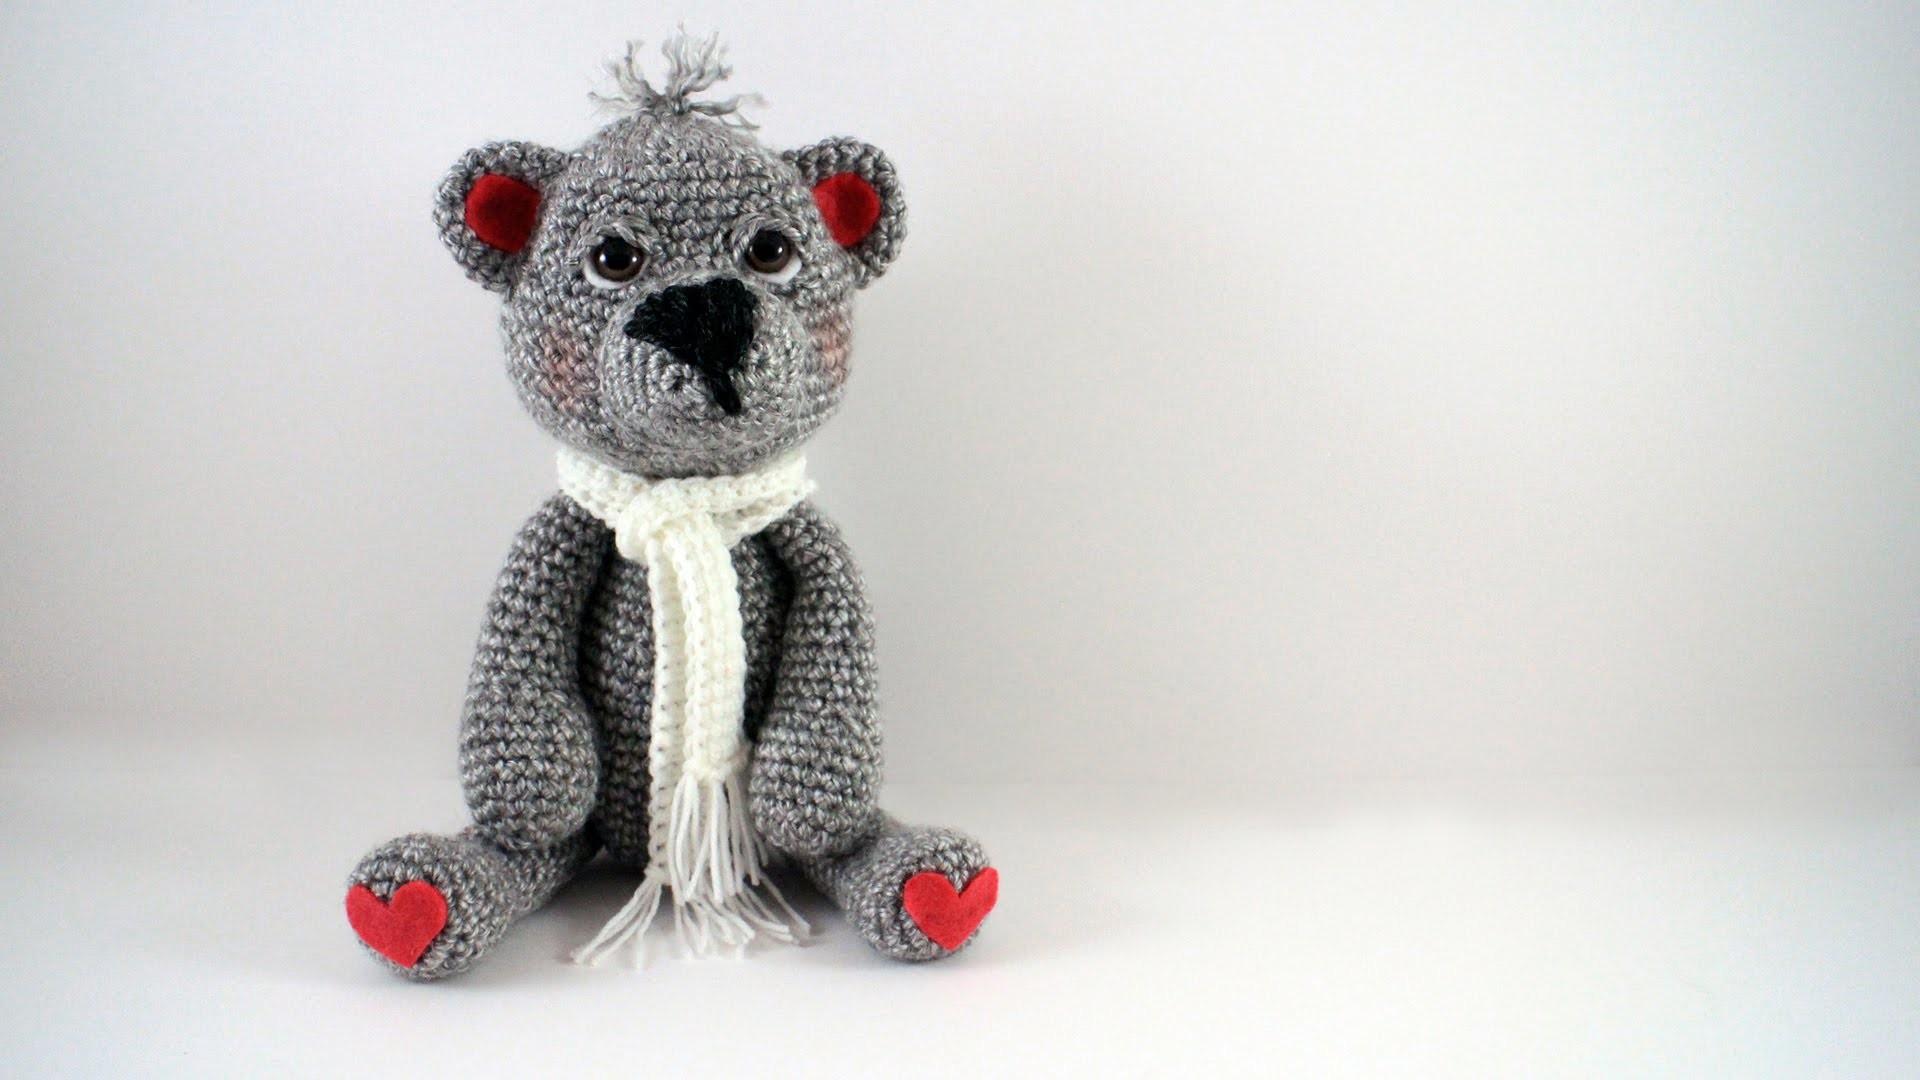 How to Crochet a Teddy Bear Left Handed Video 1